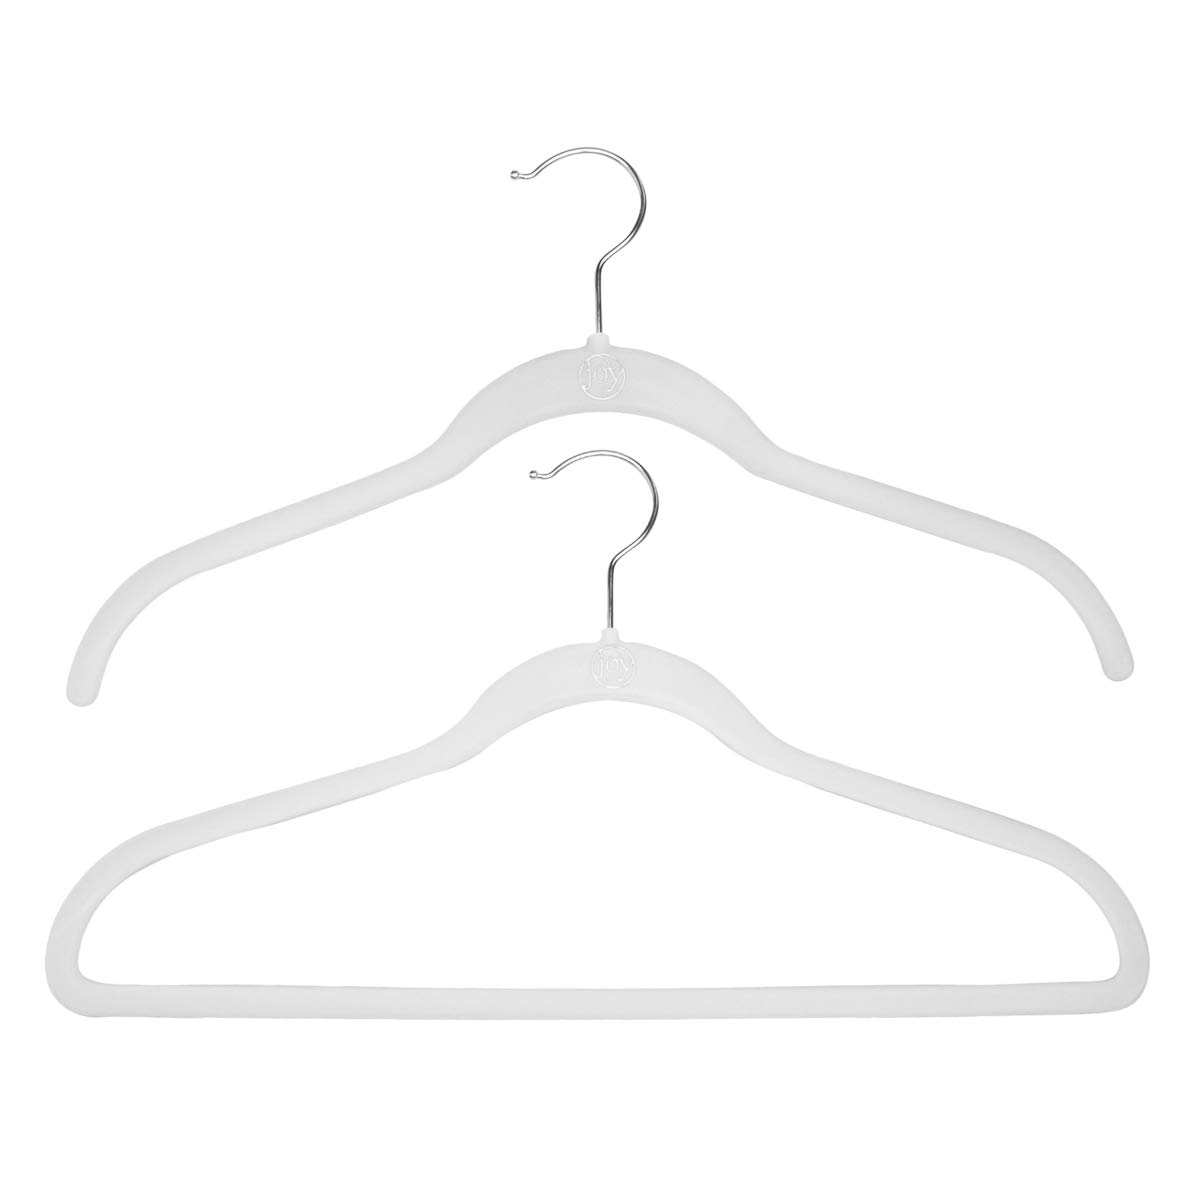 Joy Mangano 120 Pack White Huggable Hangers Non Slip Velvet Hangers Space Saving Clothes Hangers by Joy Mangano (Image #2)